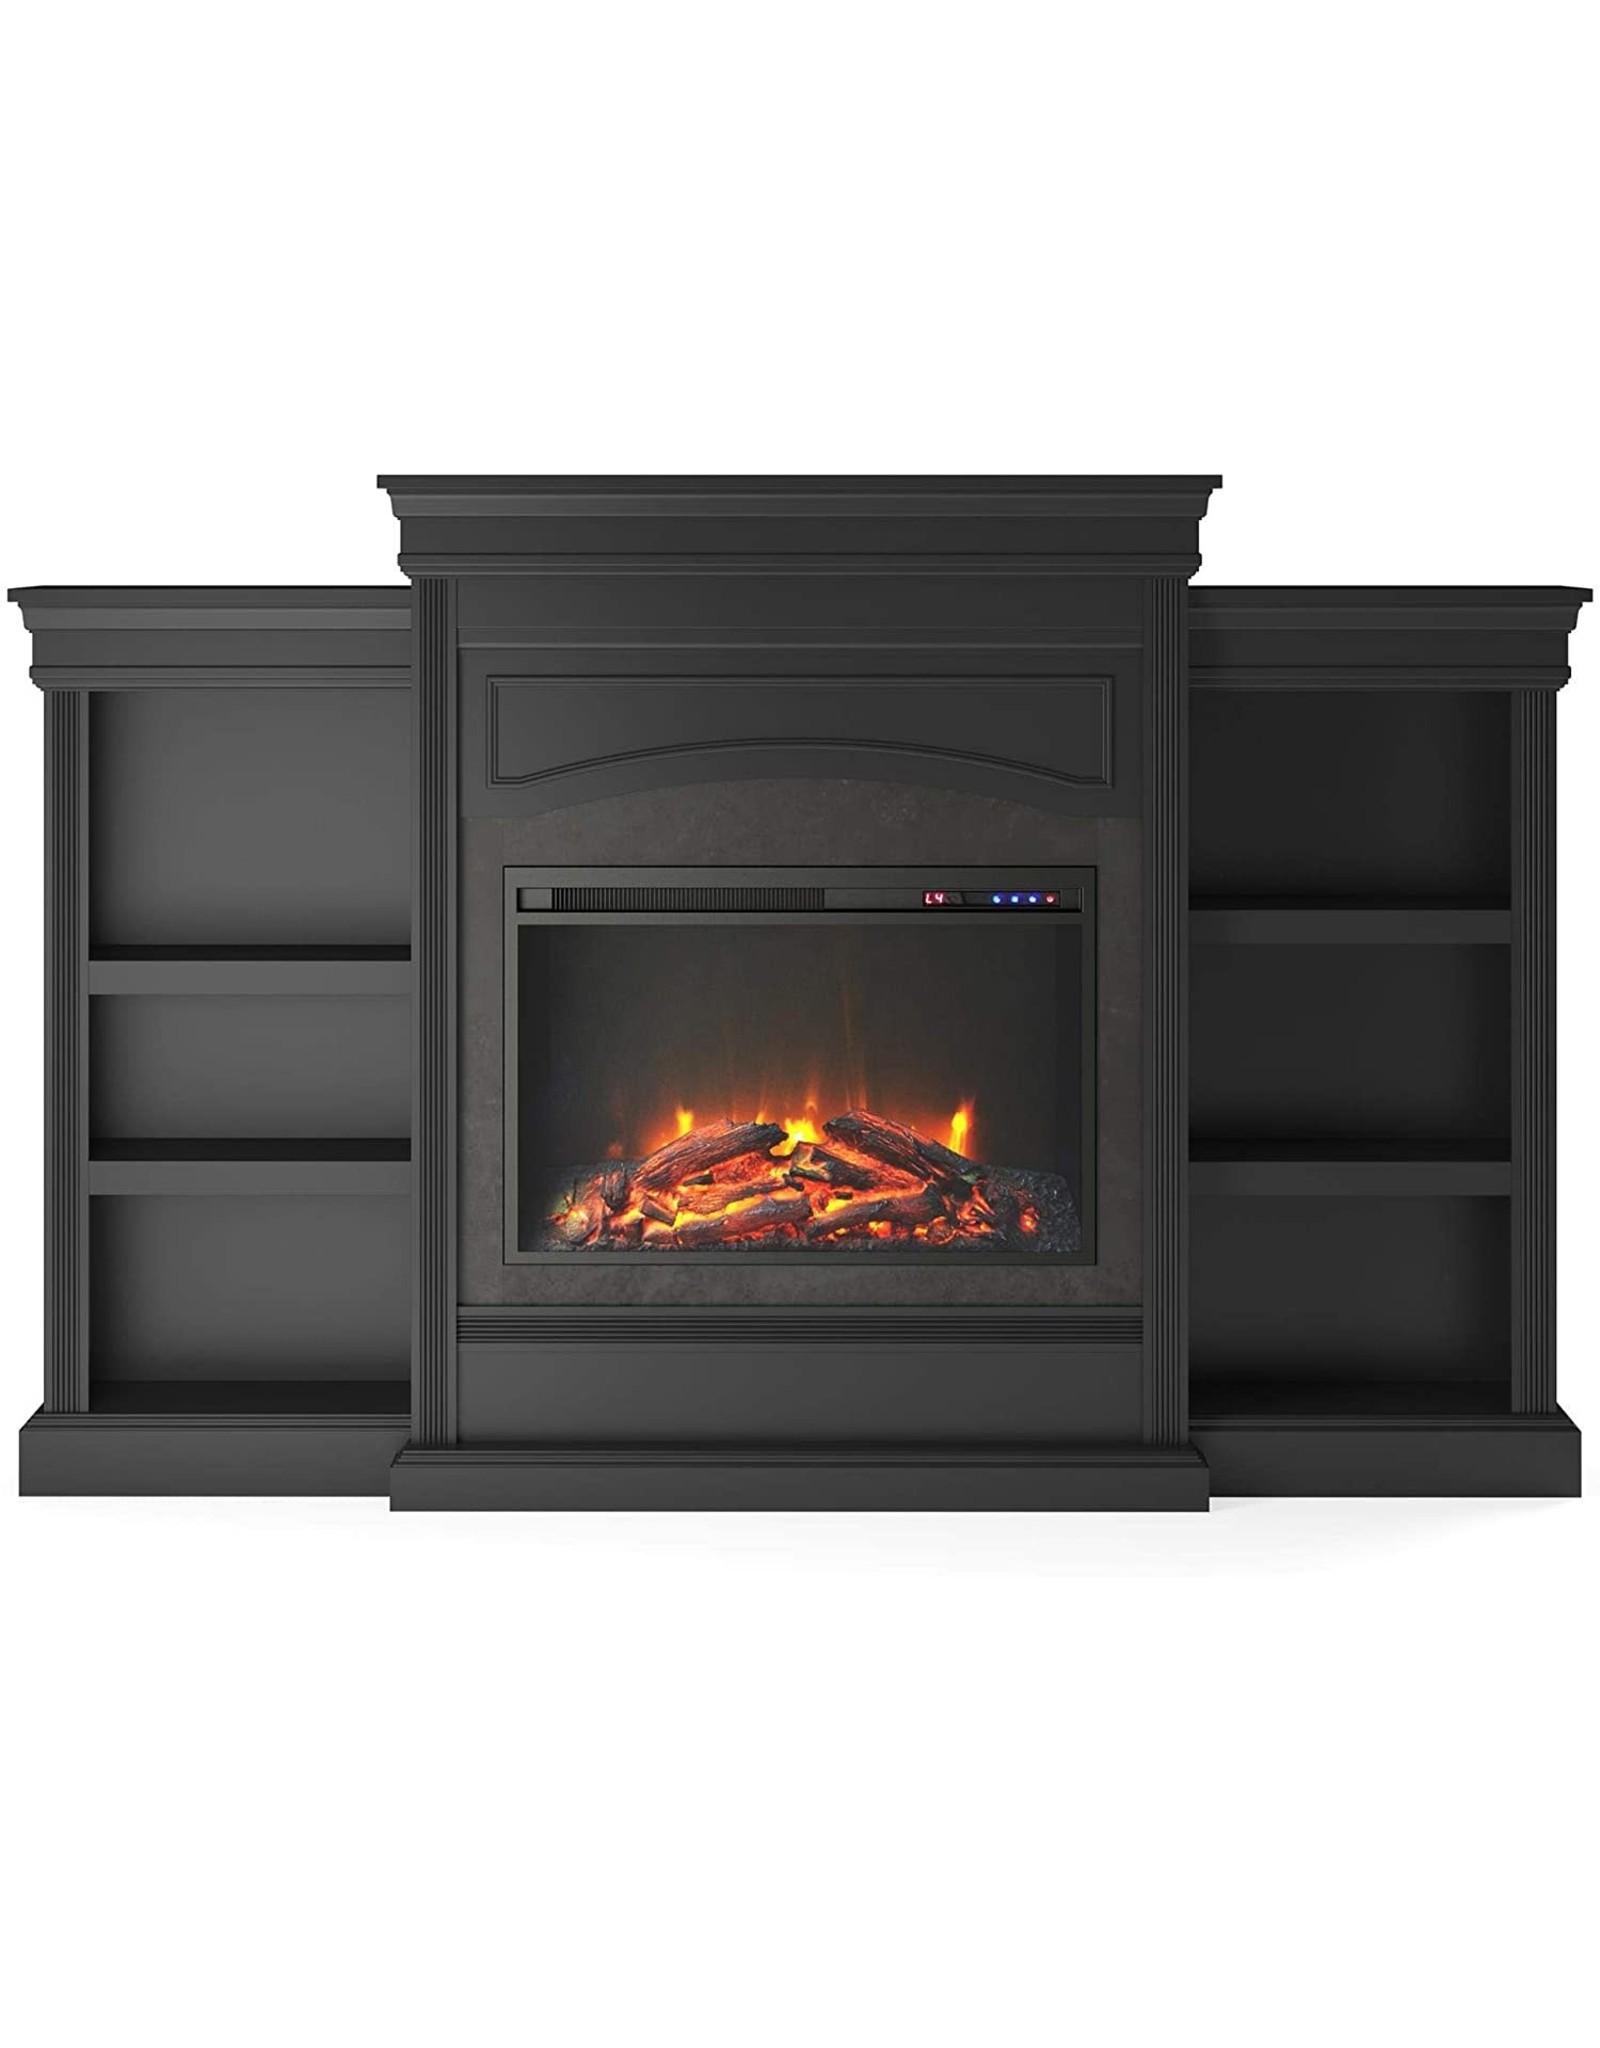 Ameriwood Home Ameriwood Home Lamont Mantel Fireplace, Black